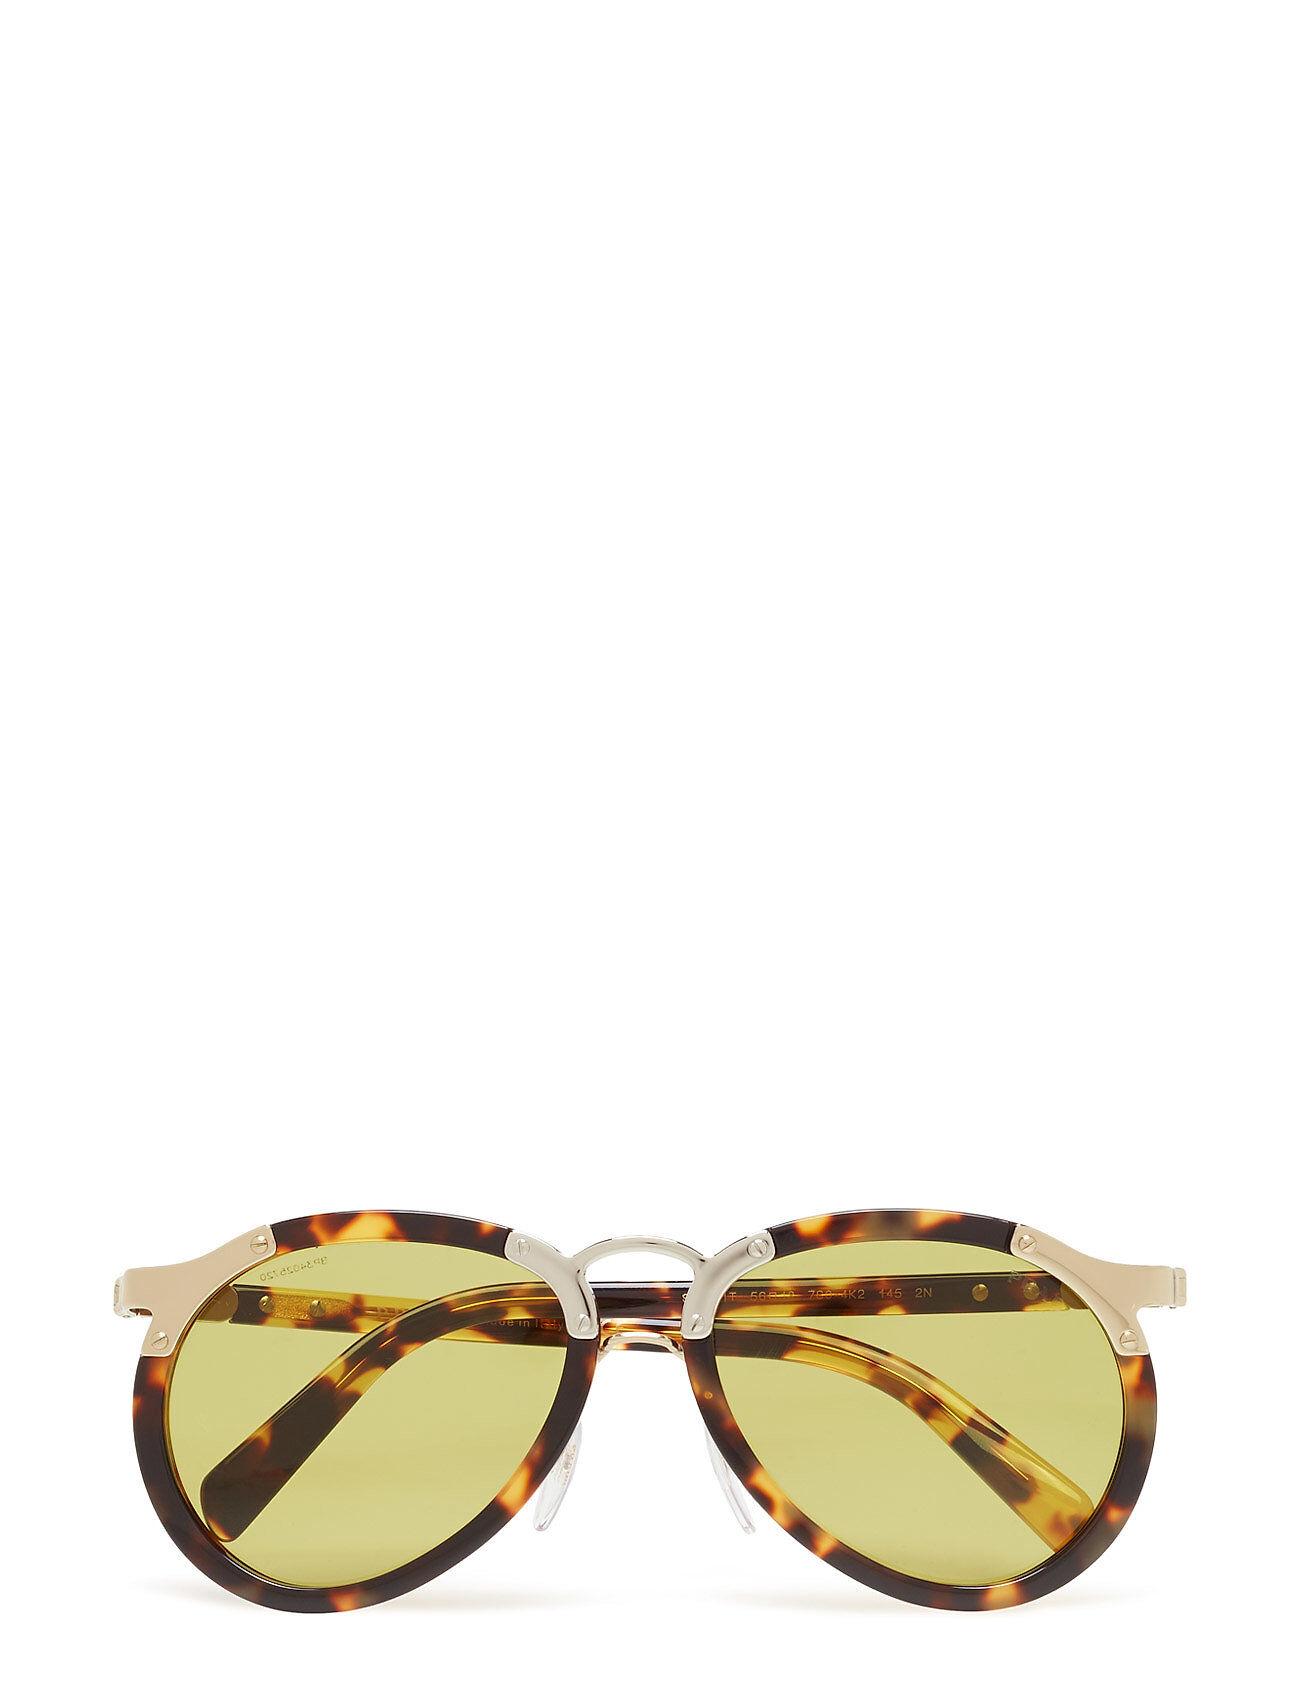 Image of Prada Sunglasses Catwalk Pilottilasit Aurinkolasit Kulta Prada Sunglasses